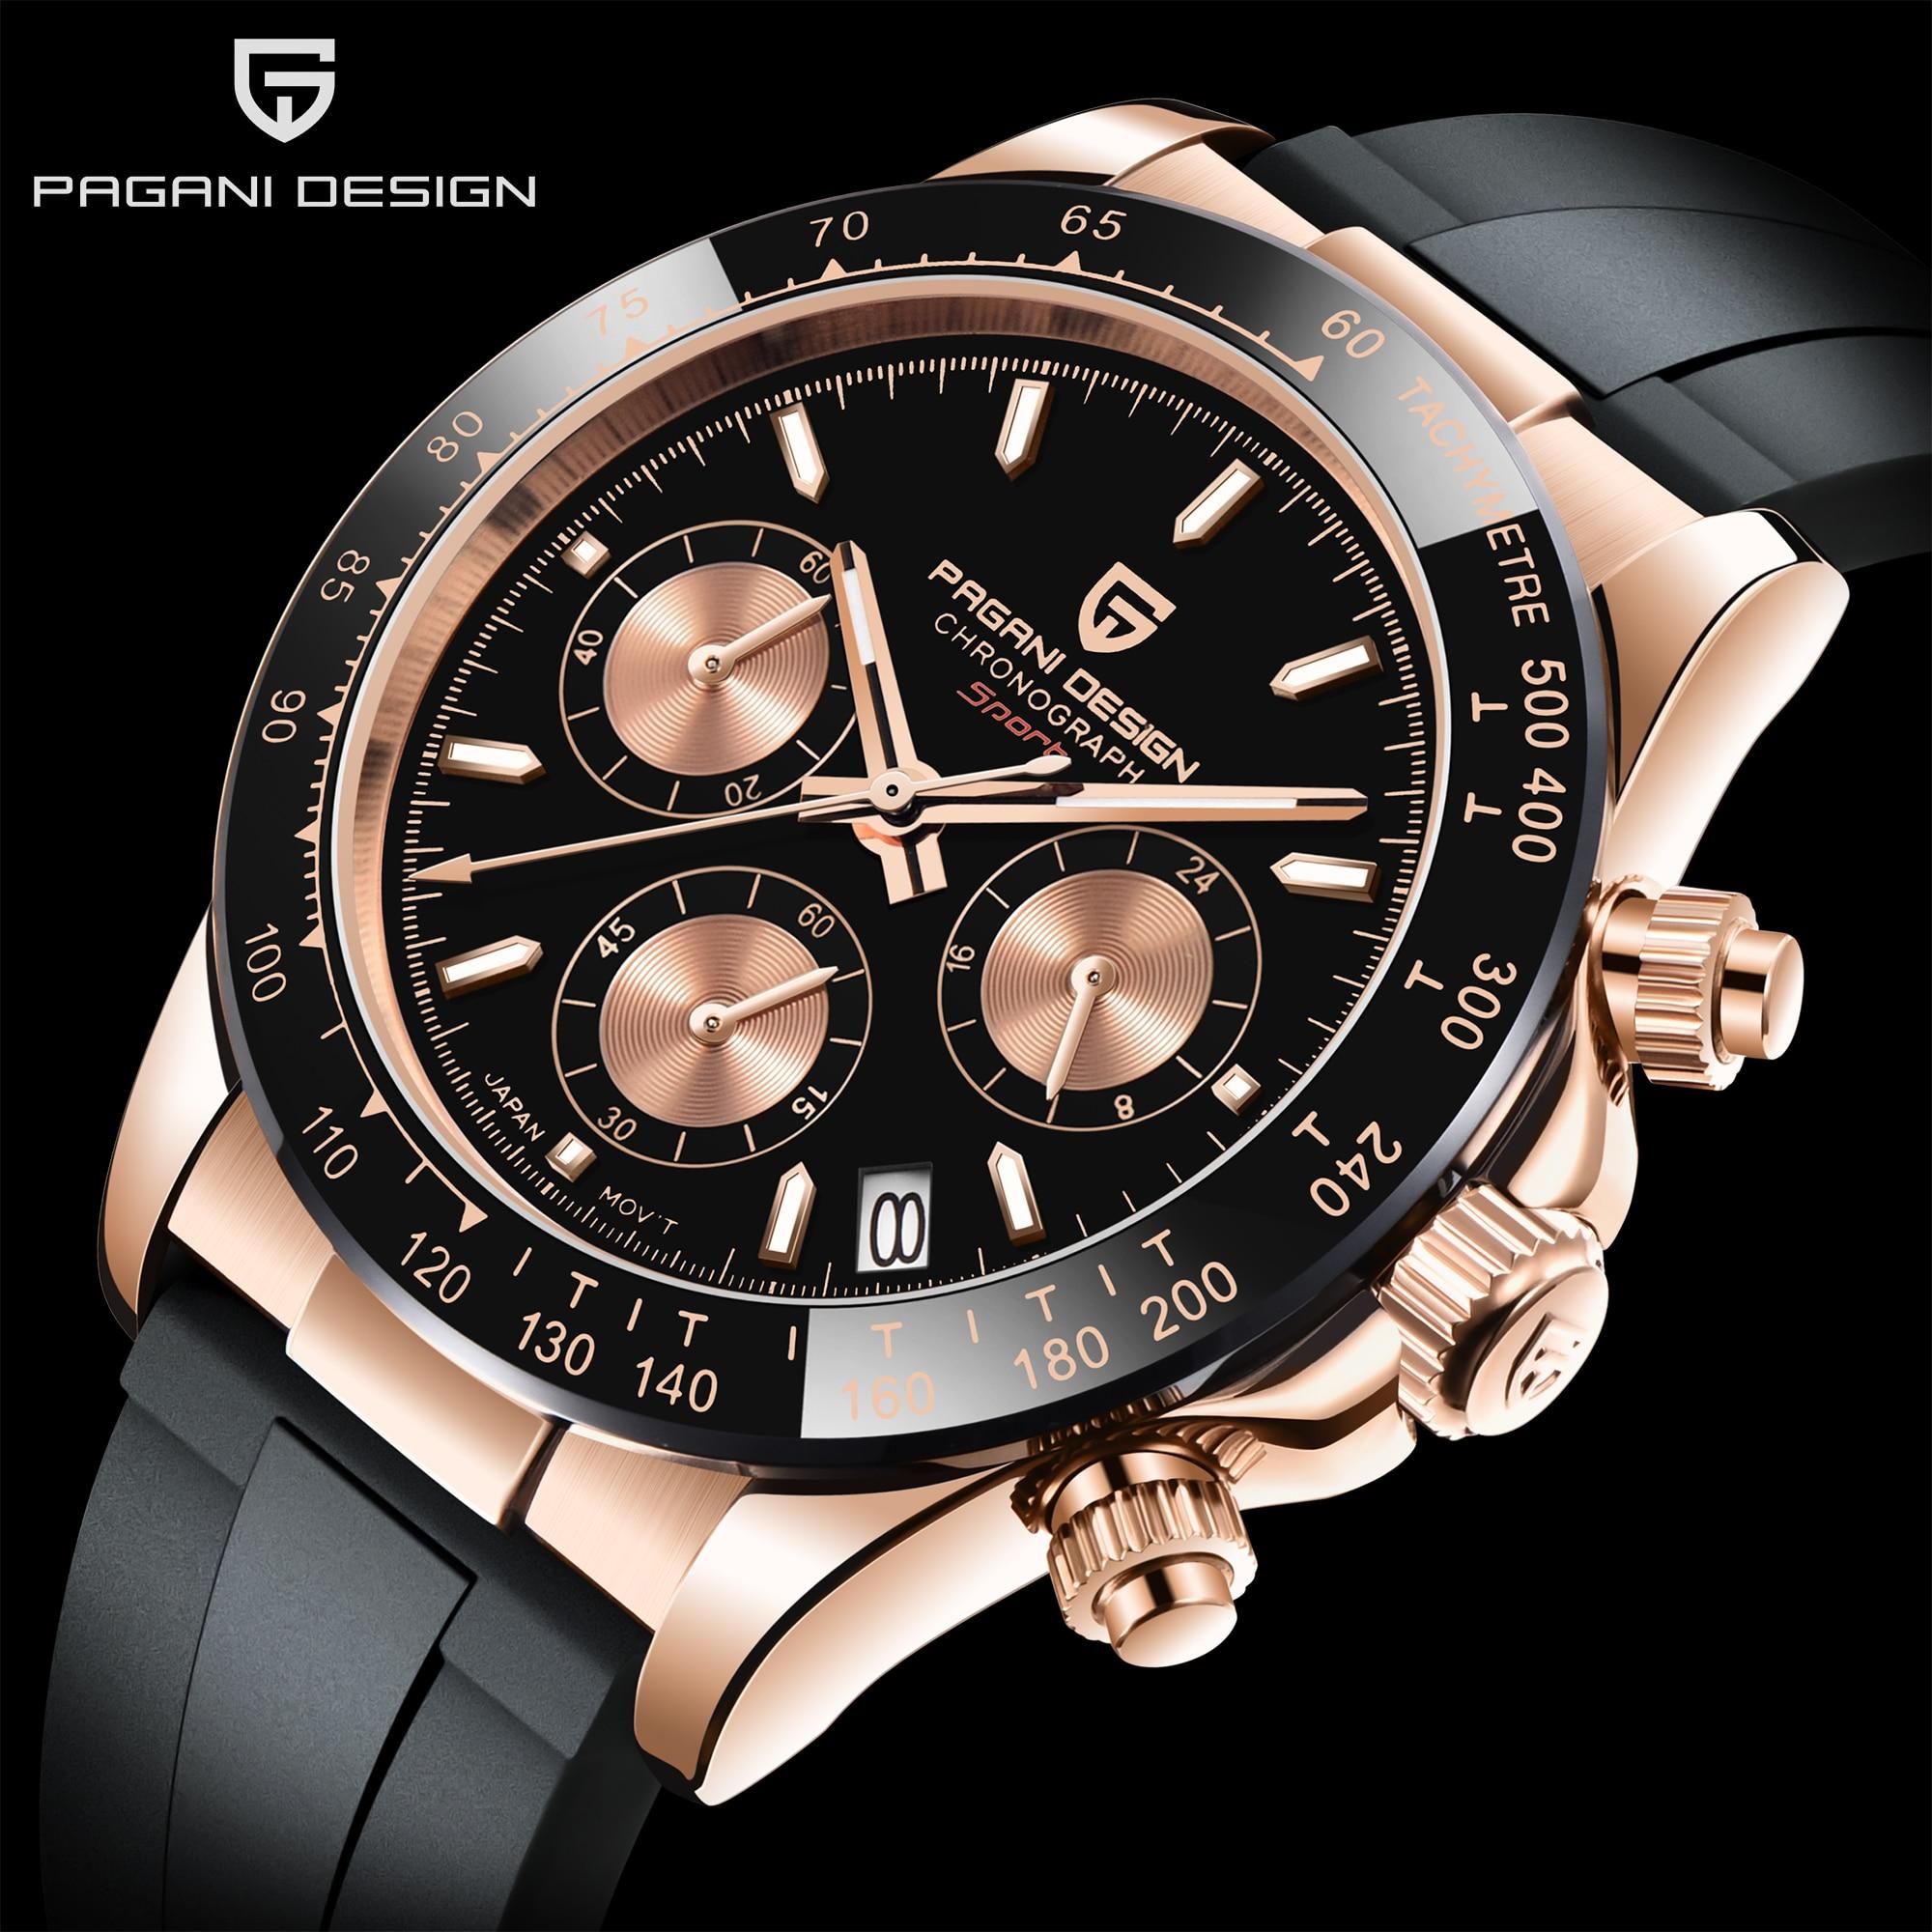 2021 New PAGANI DESIGN Top Brand Men Quartz Watches Sapphire Automatic Date Chronograph Japan VK63 Waterproof Watch Reloj Hombre